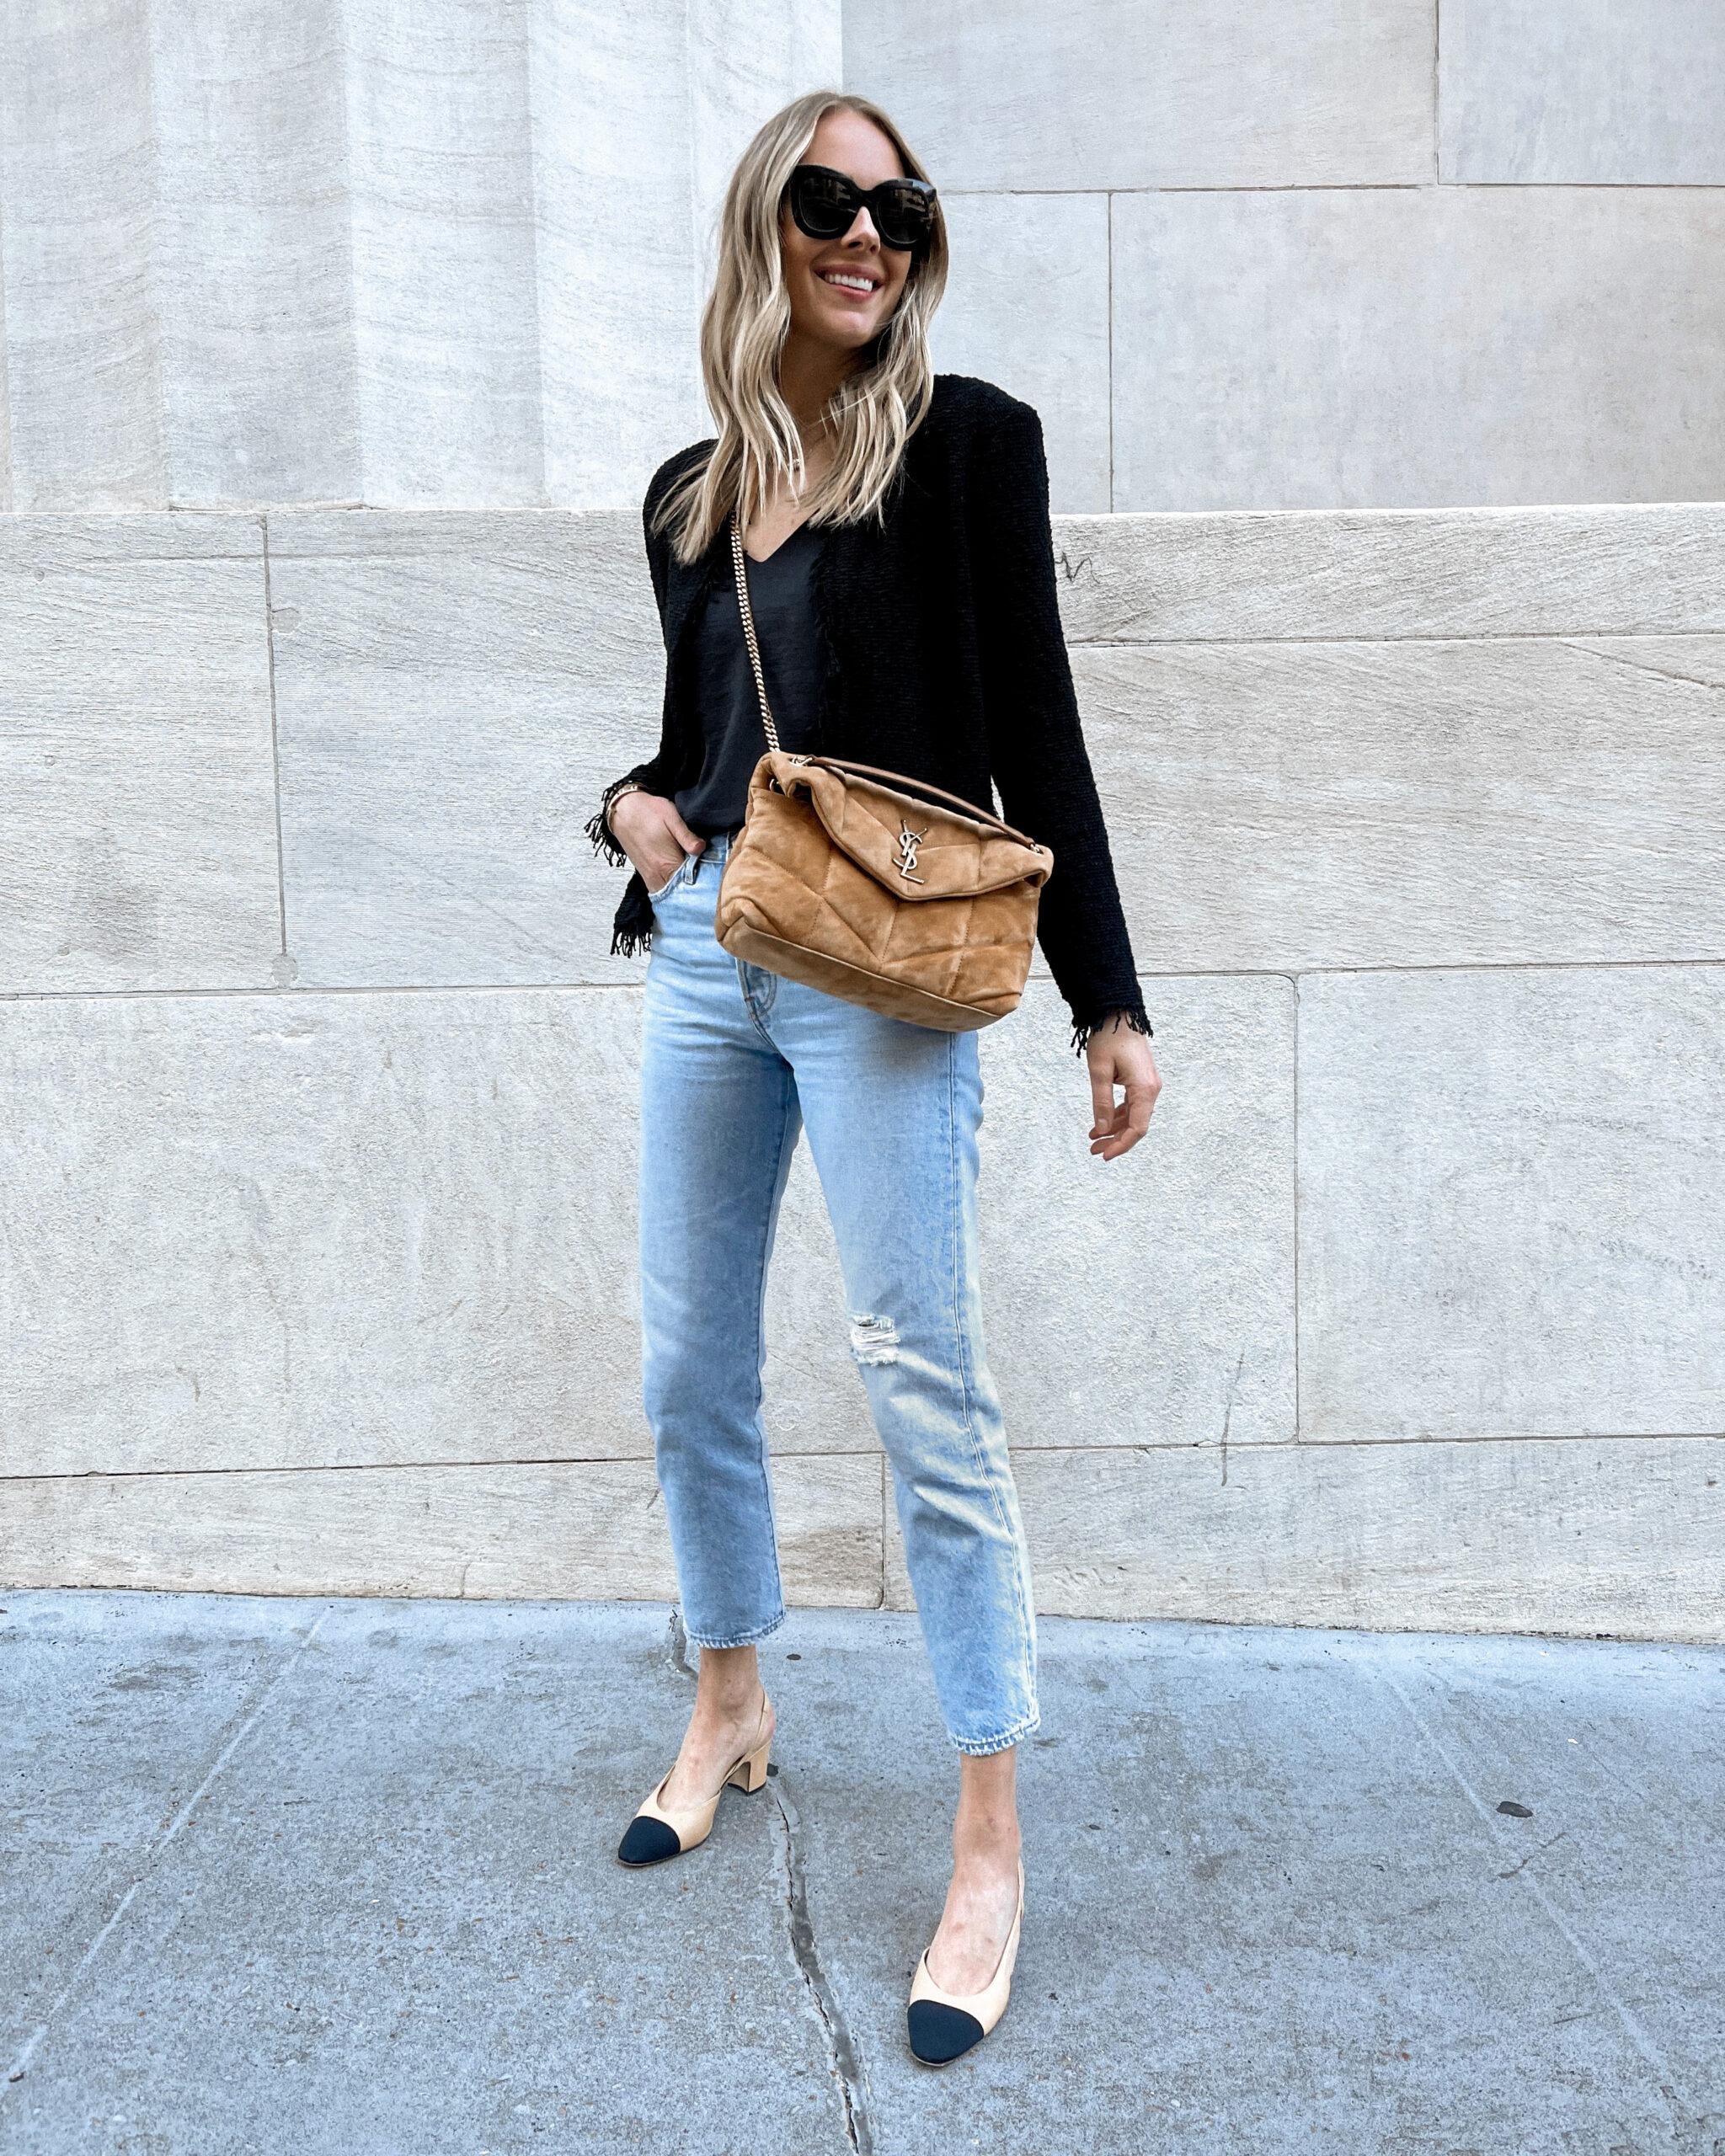 Fashion Jackson Wearing IRO Tweed Jacket Ripped Jeans Chanel Slingbacks Saint Laurent Loulou Tan Suede Handbag Fall Outfit